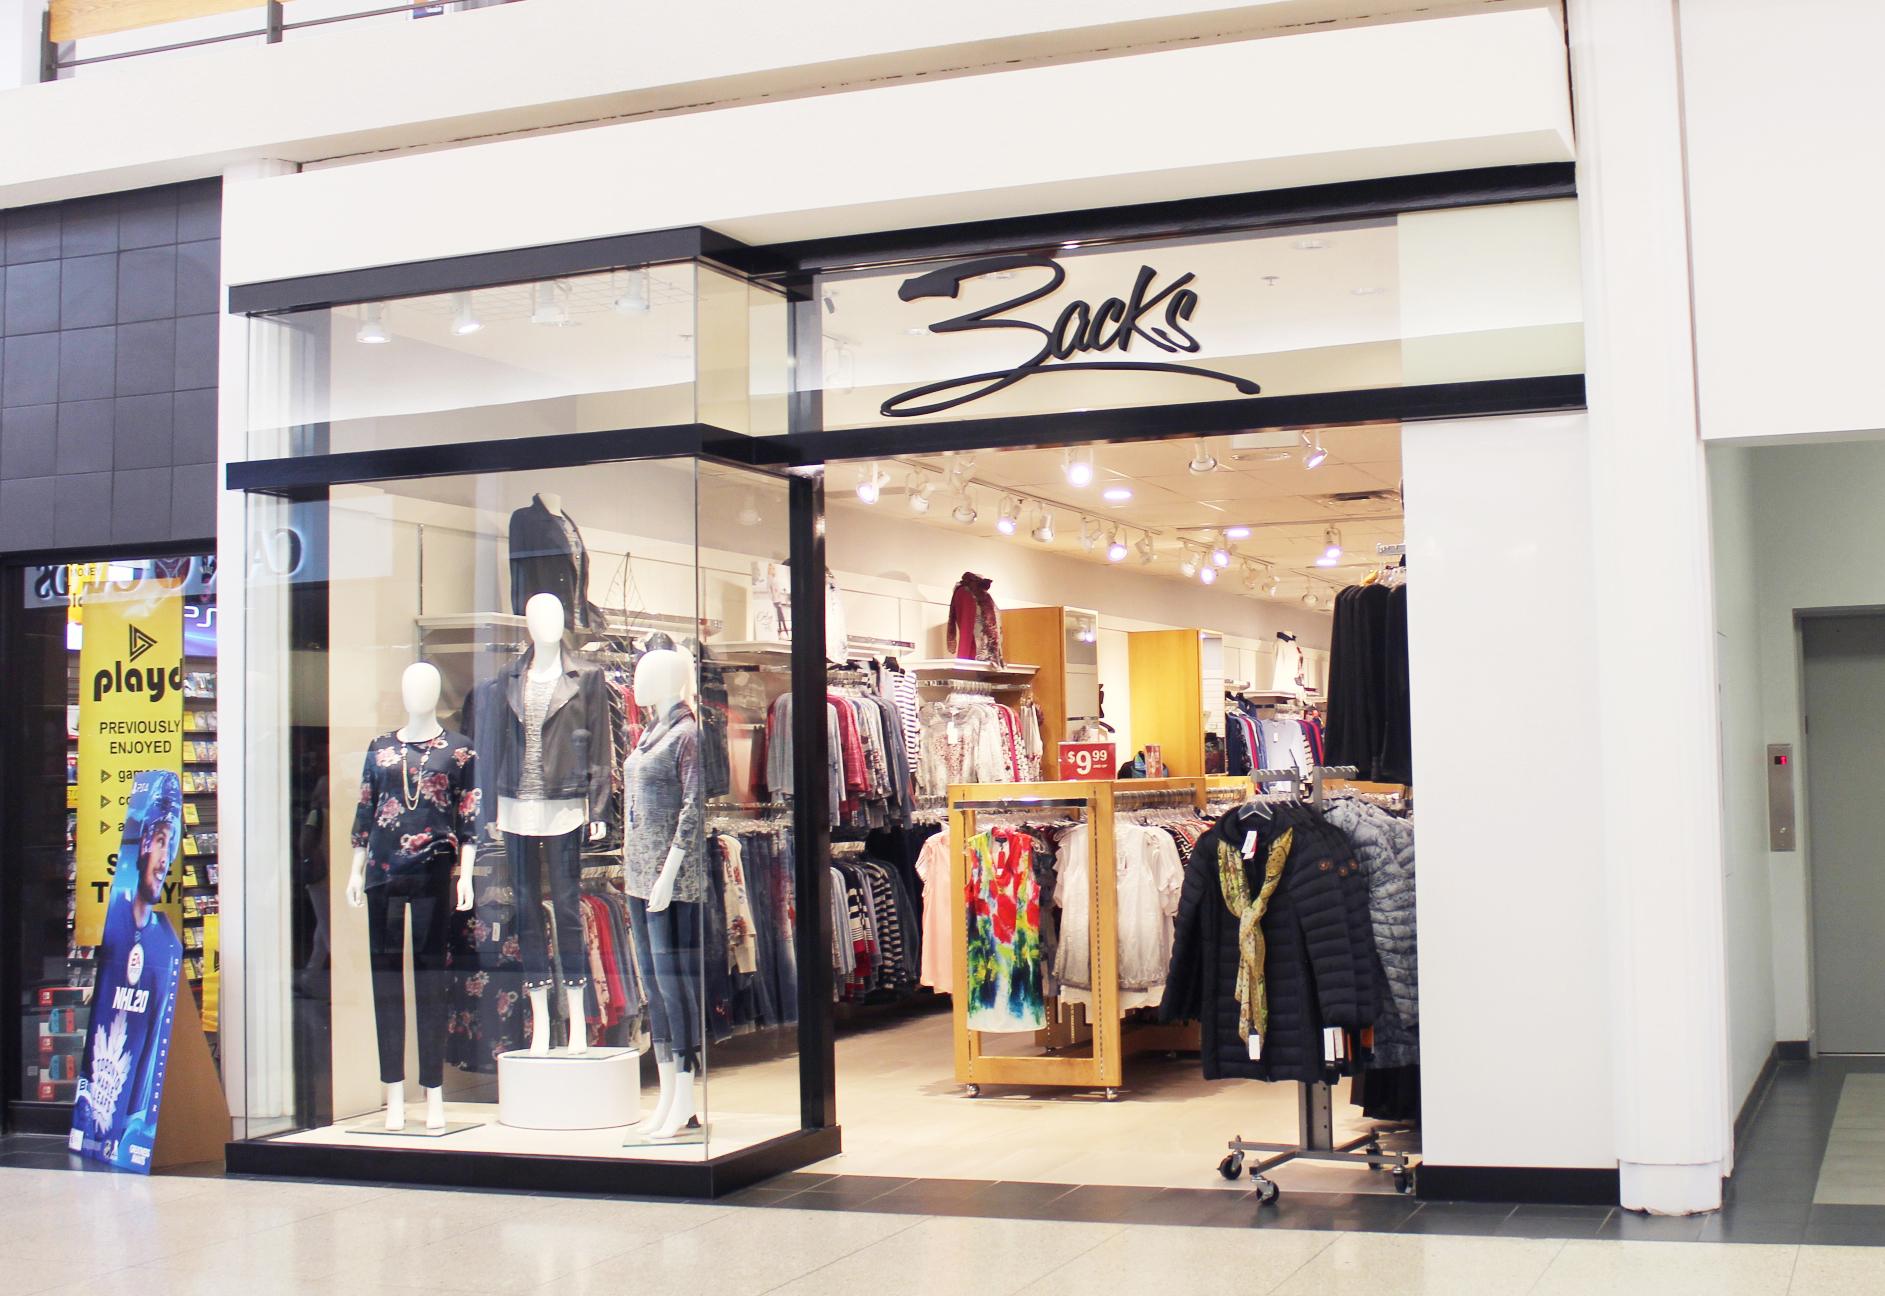 Zacks Fashions